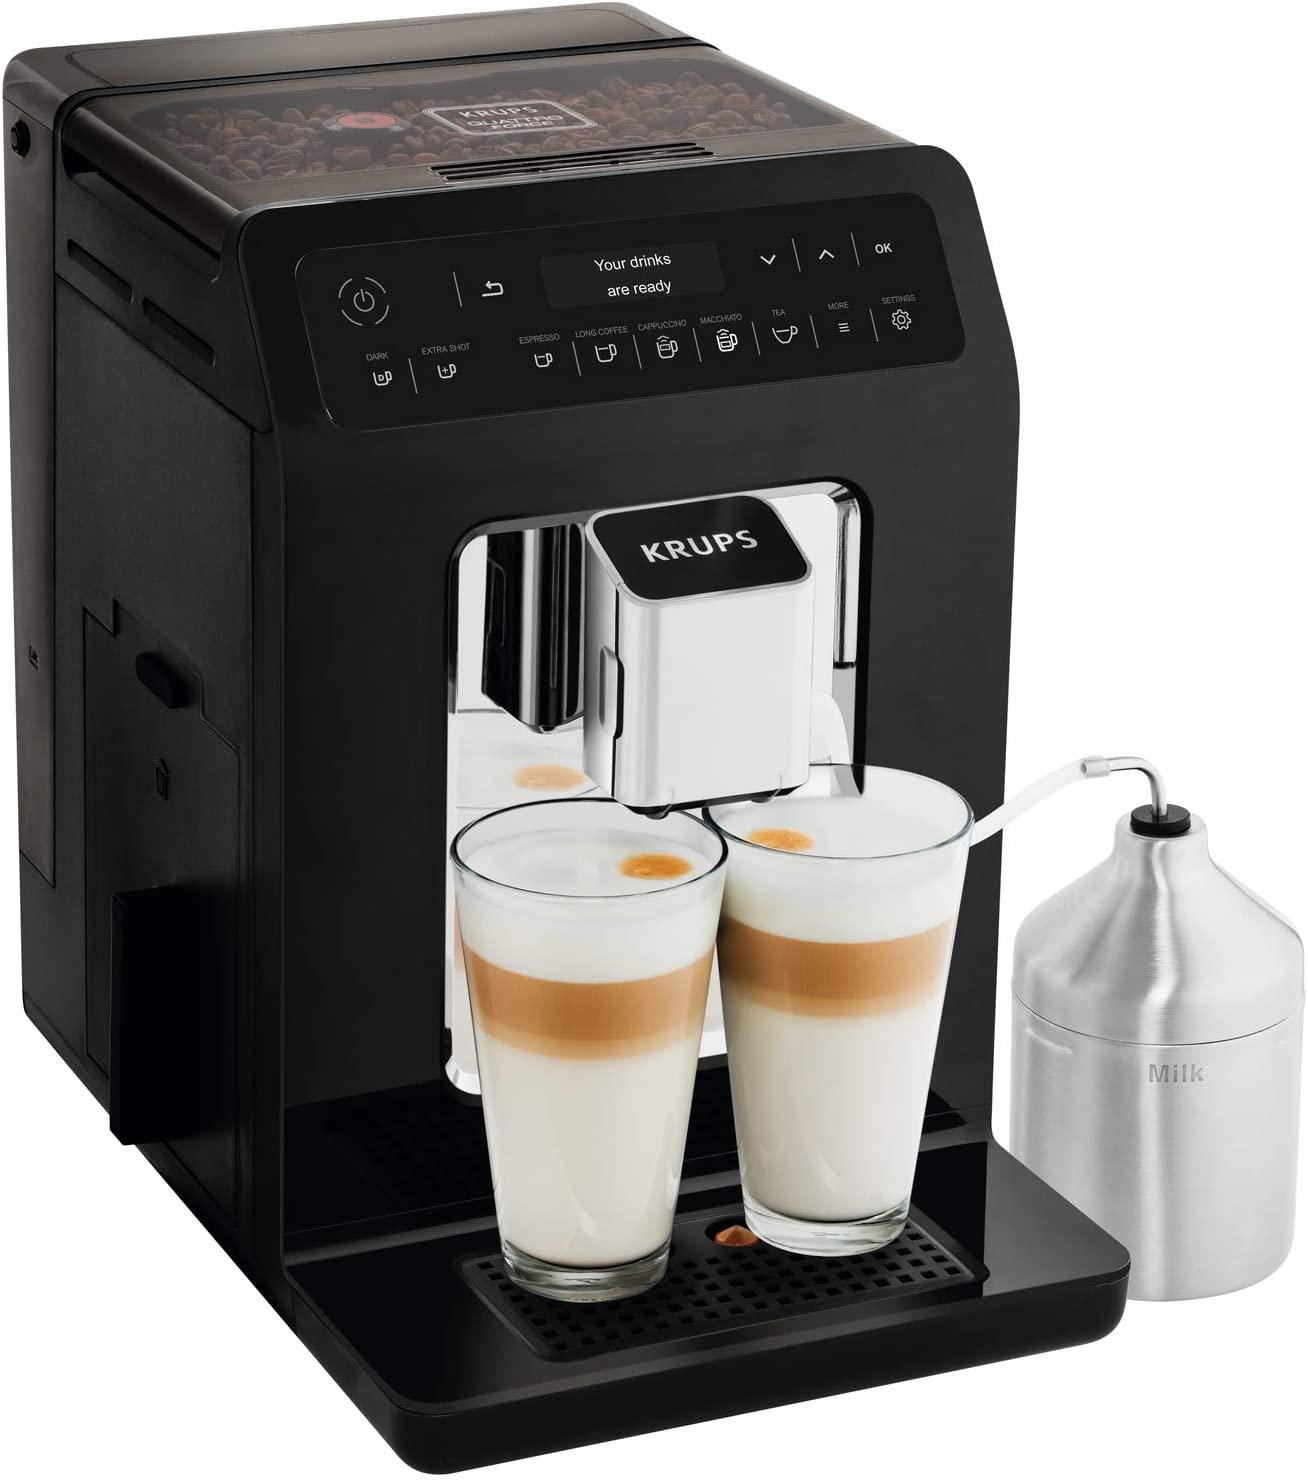 Krups Evidence EA8918 Volautomatische Espressomachine na cashback @ Amazon.nl